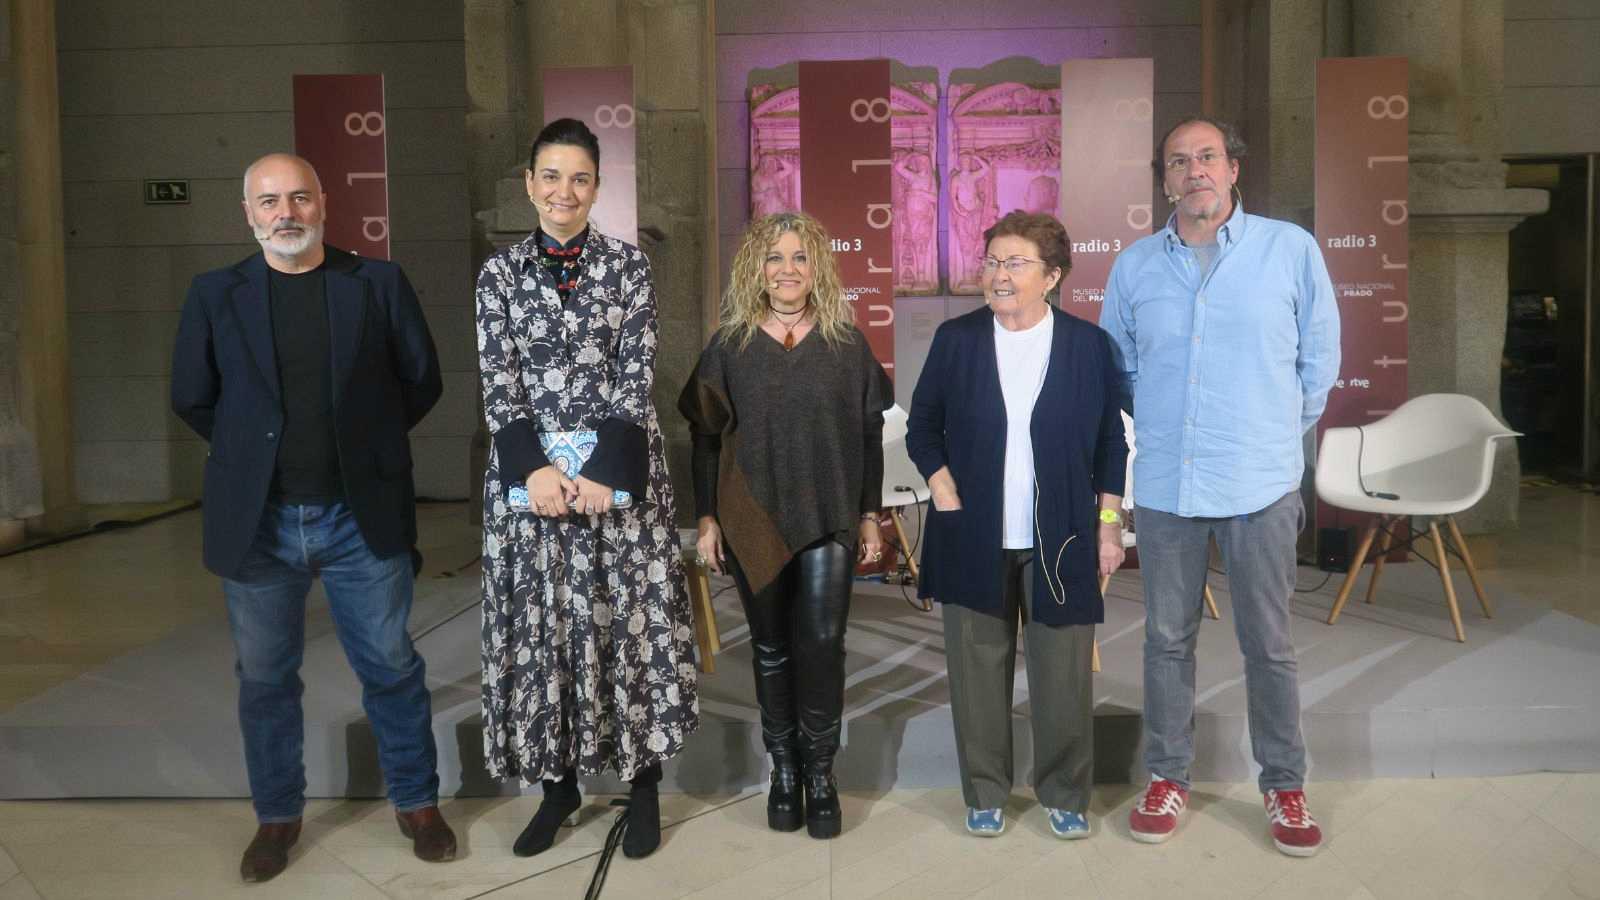 cultura18 arte transgresor museo prado